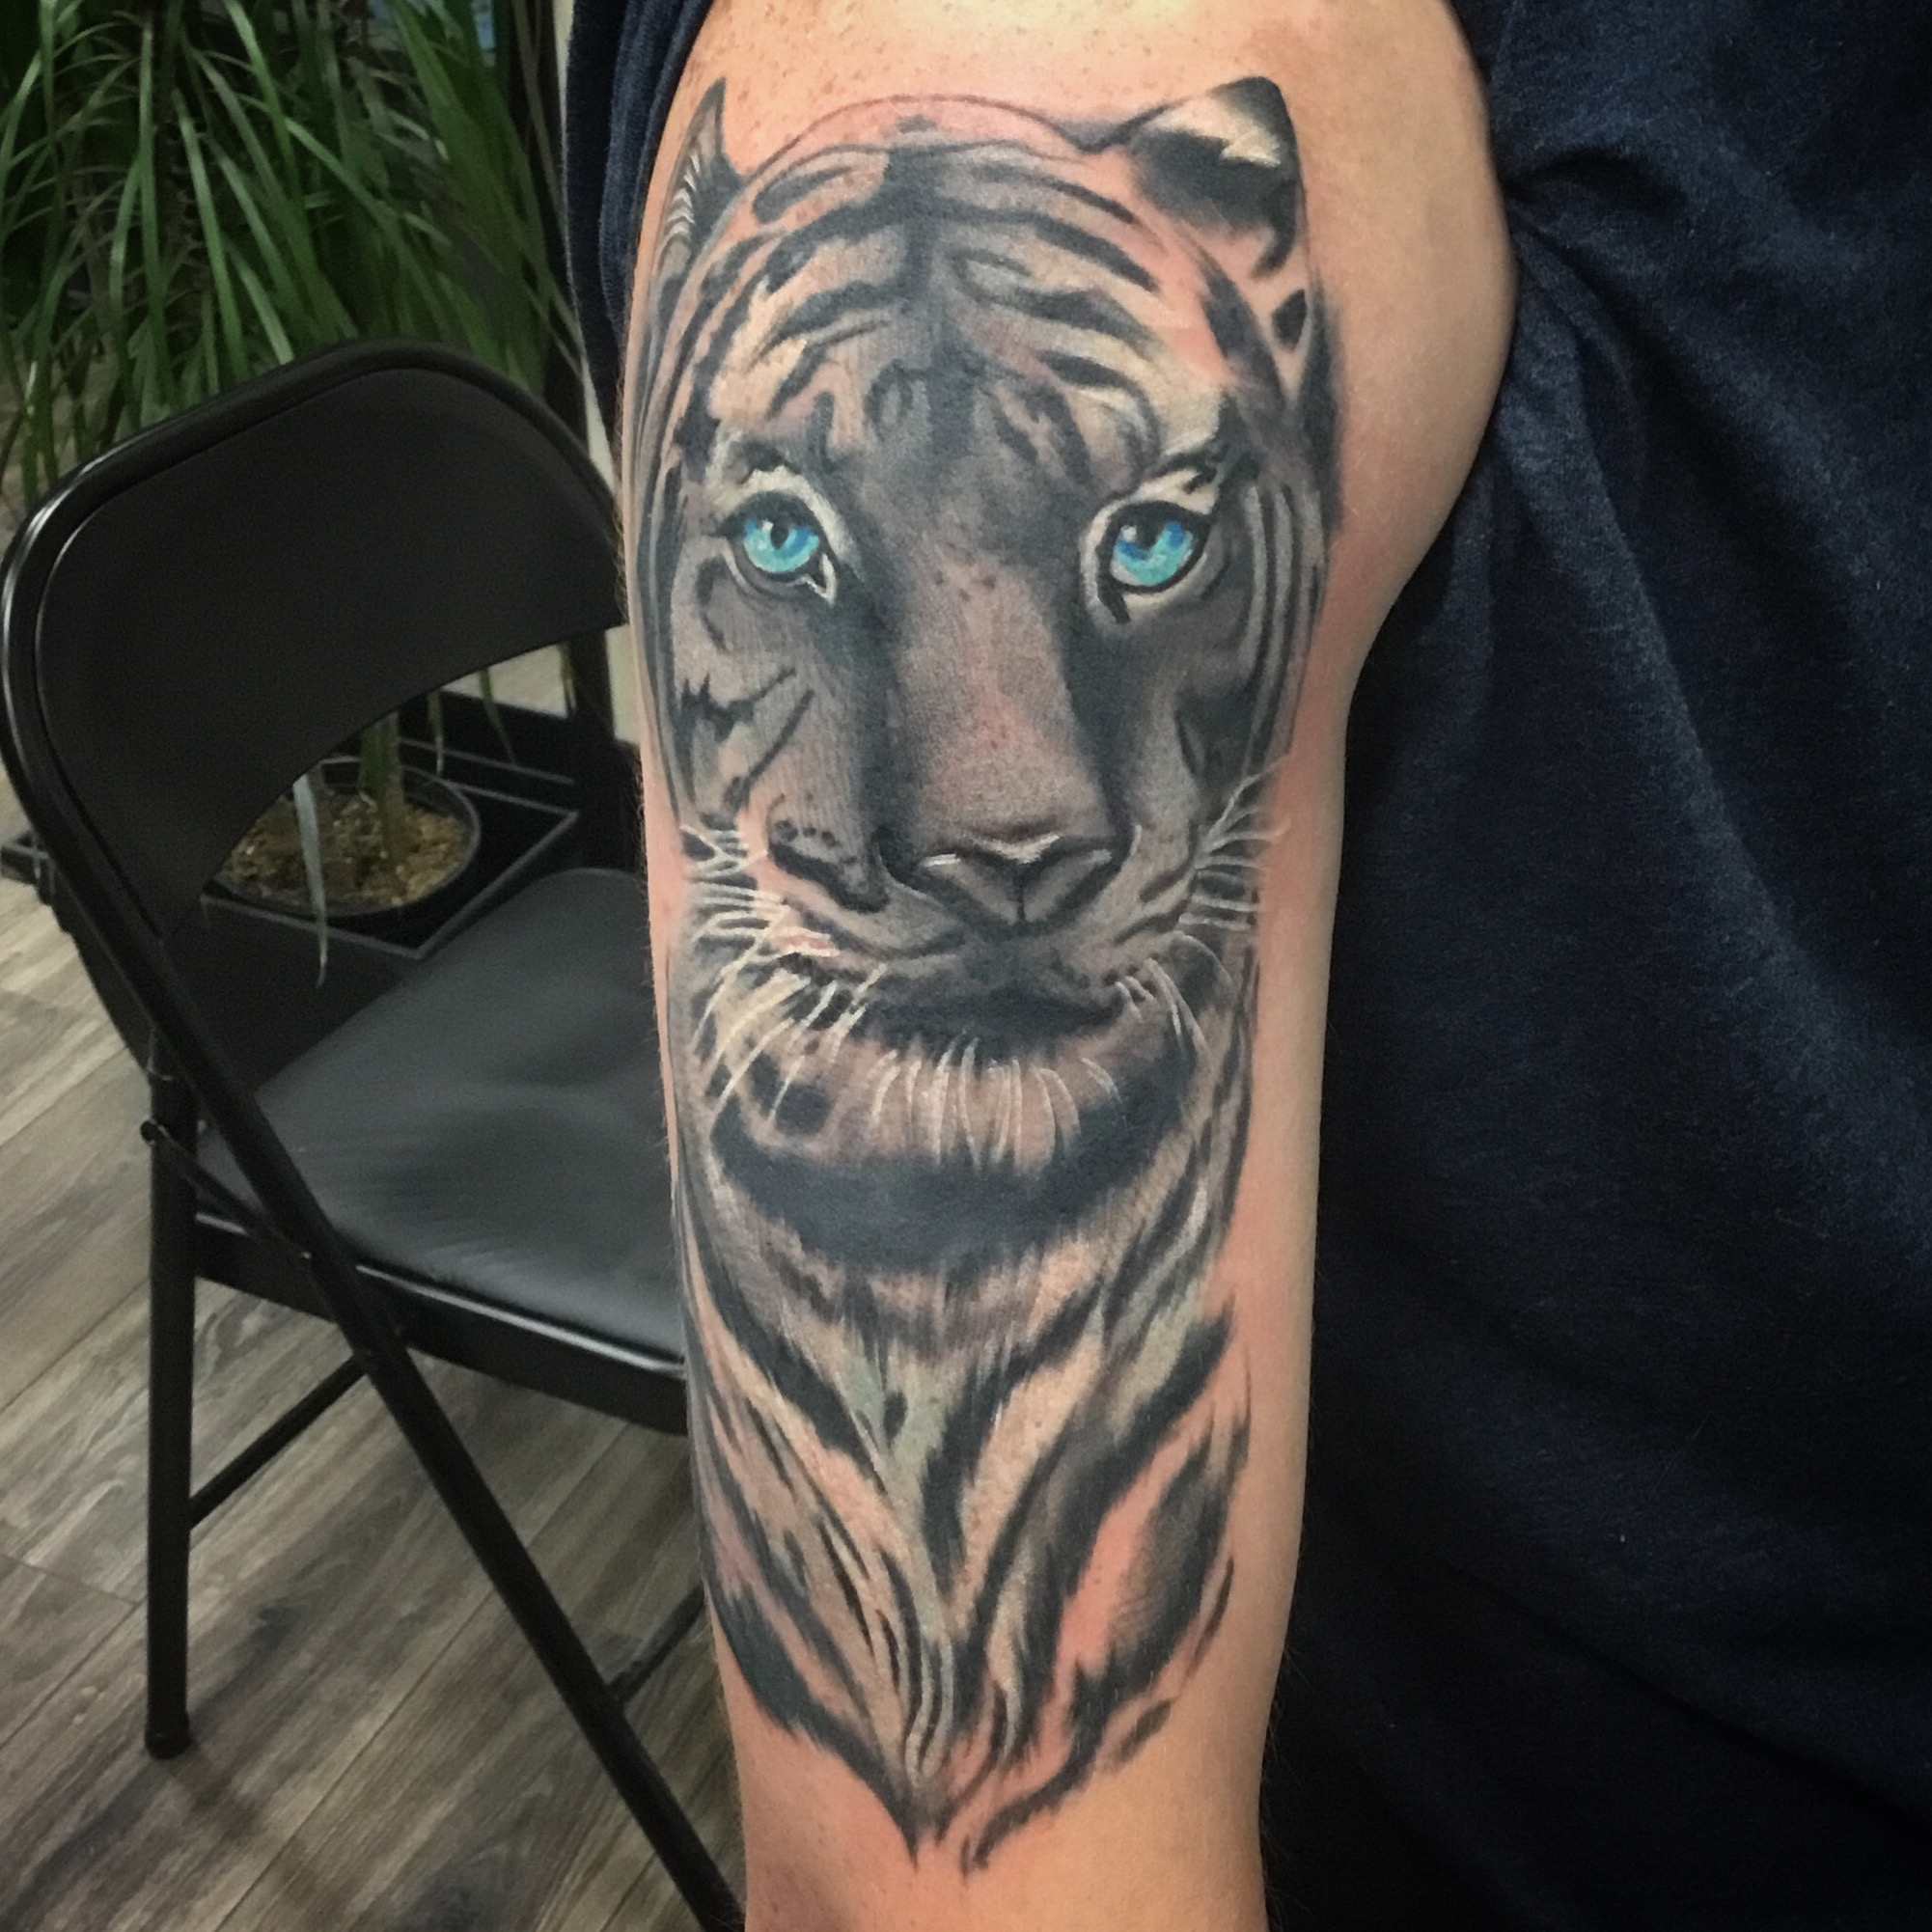 Tyler's tiger